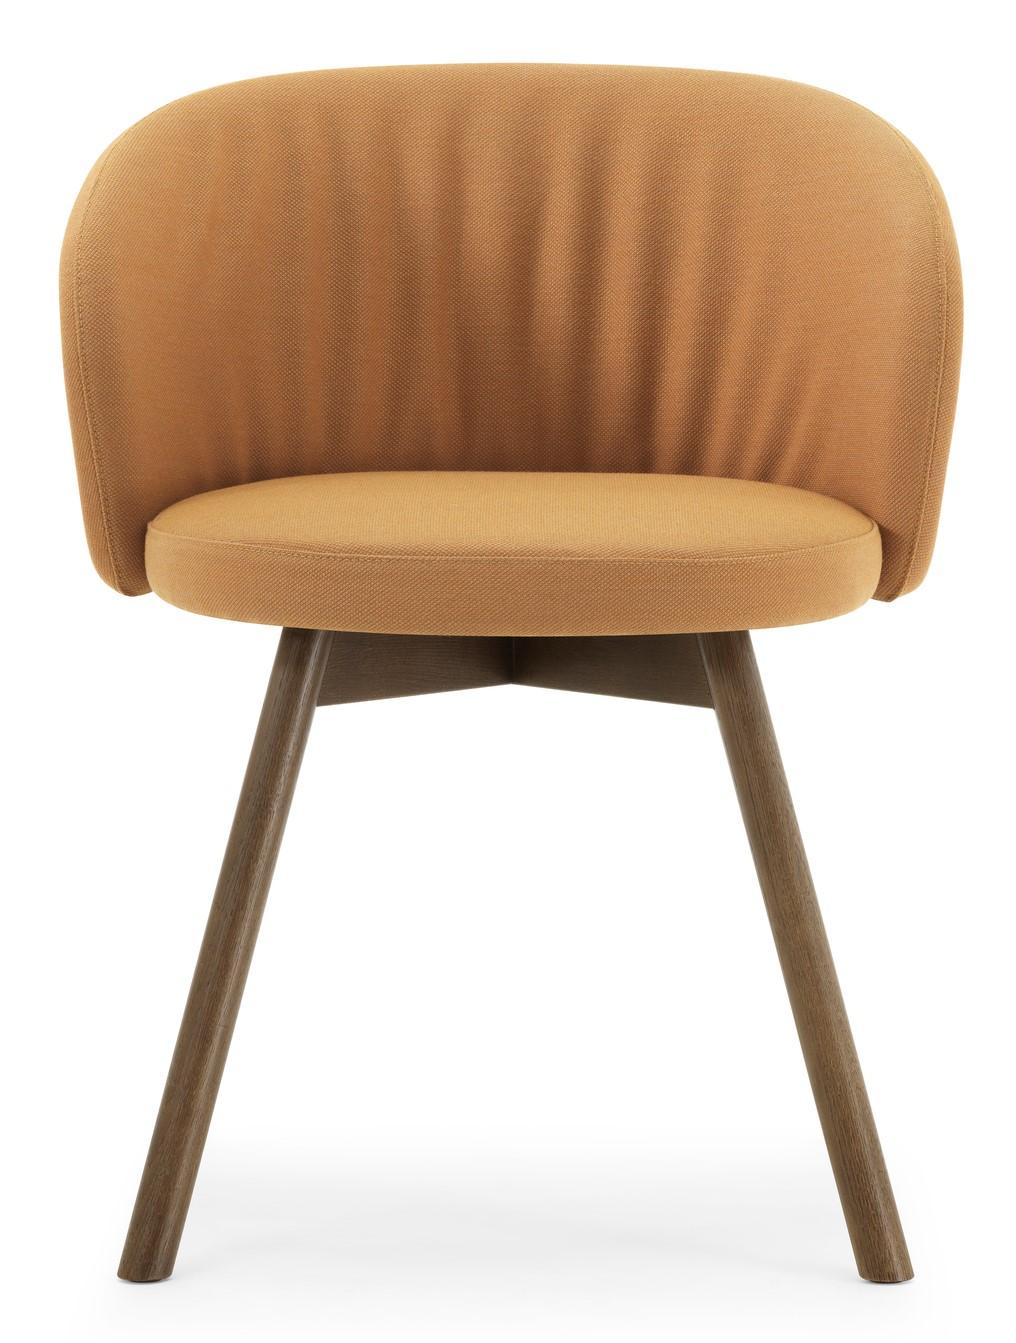 Girsberger Biala stoel